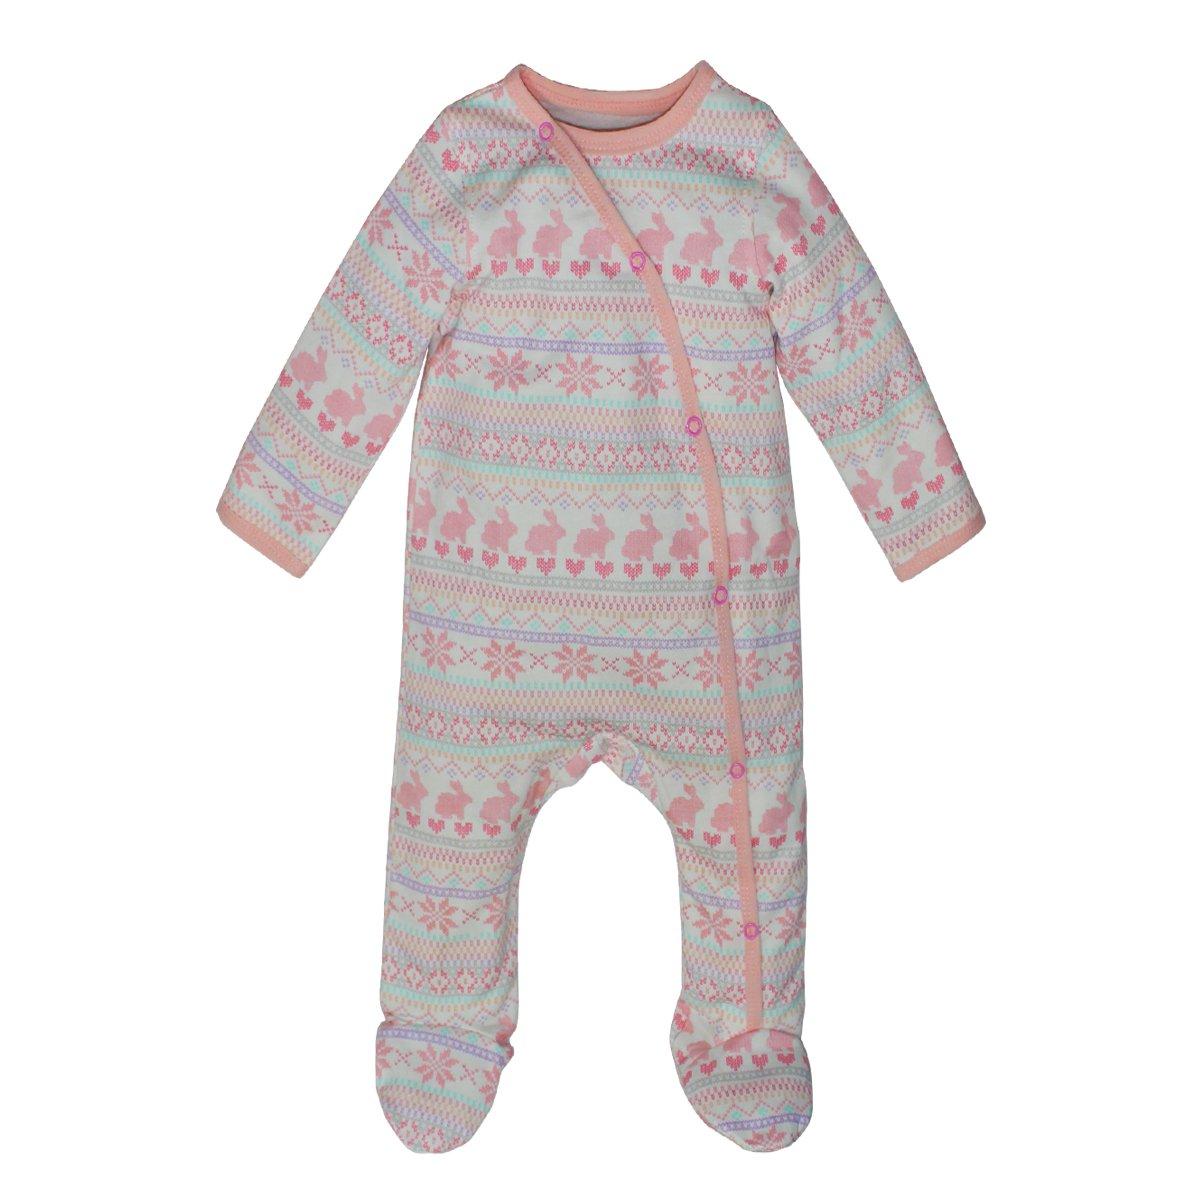 894dd8728 Kadambaby- Pink Bunny Babyody Suit Footed Romper Newborn Sleepsuit ...